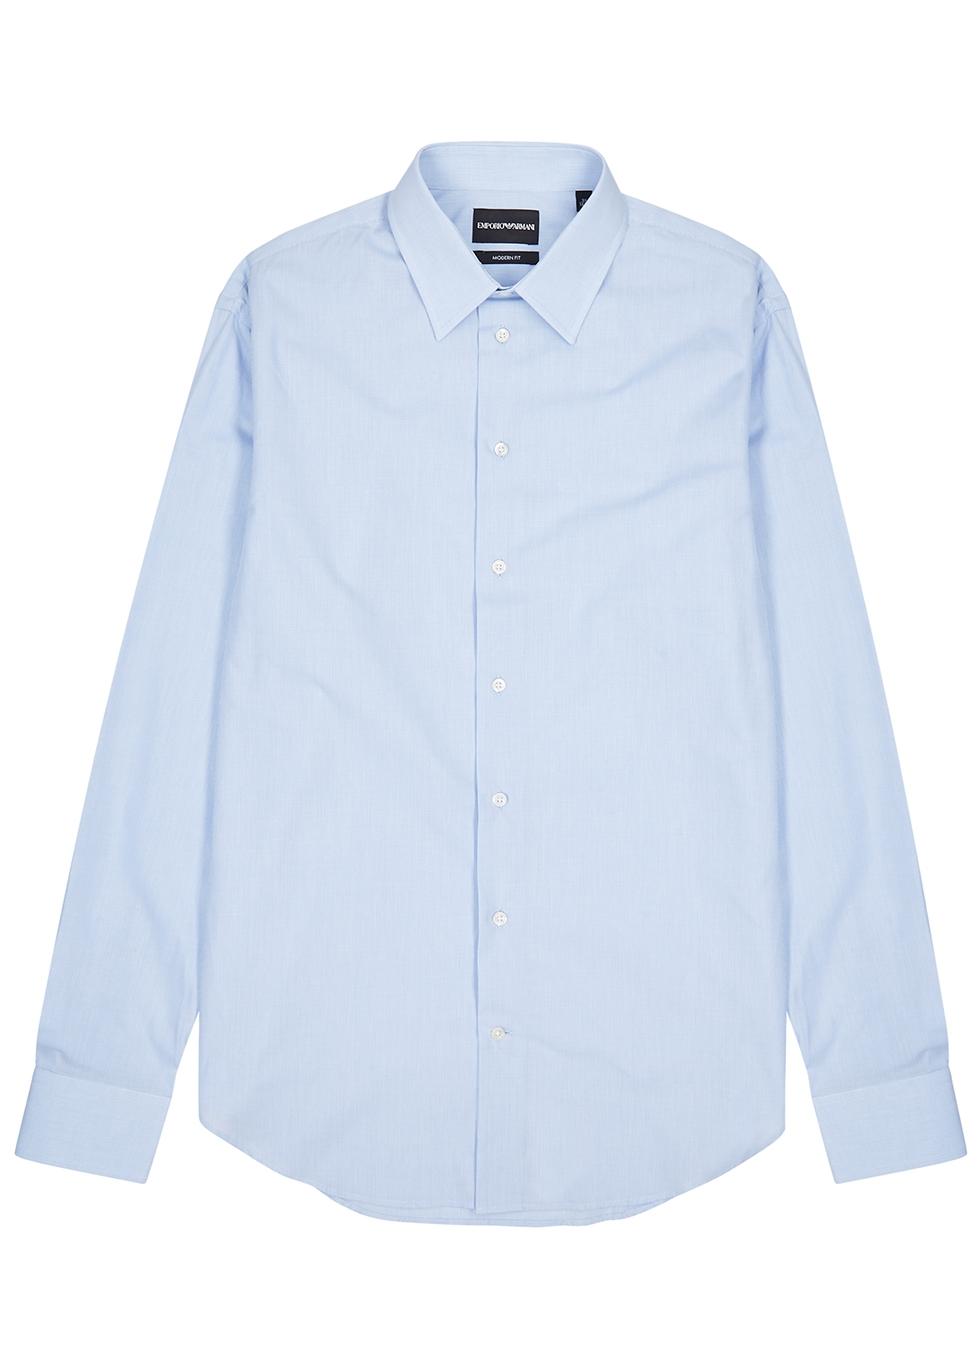 Blue checked cotton shirt